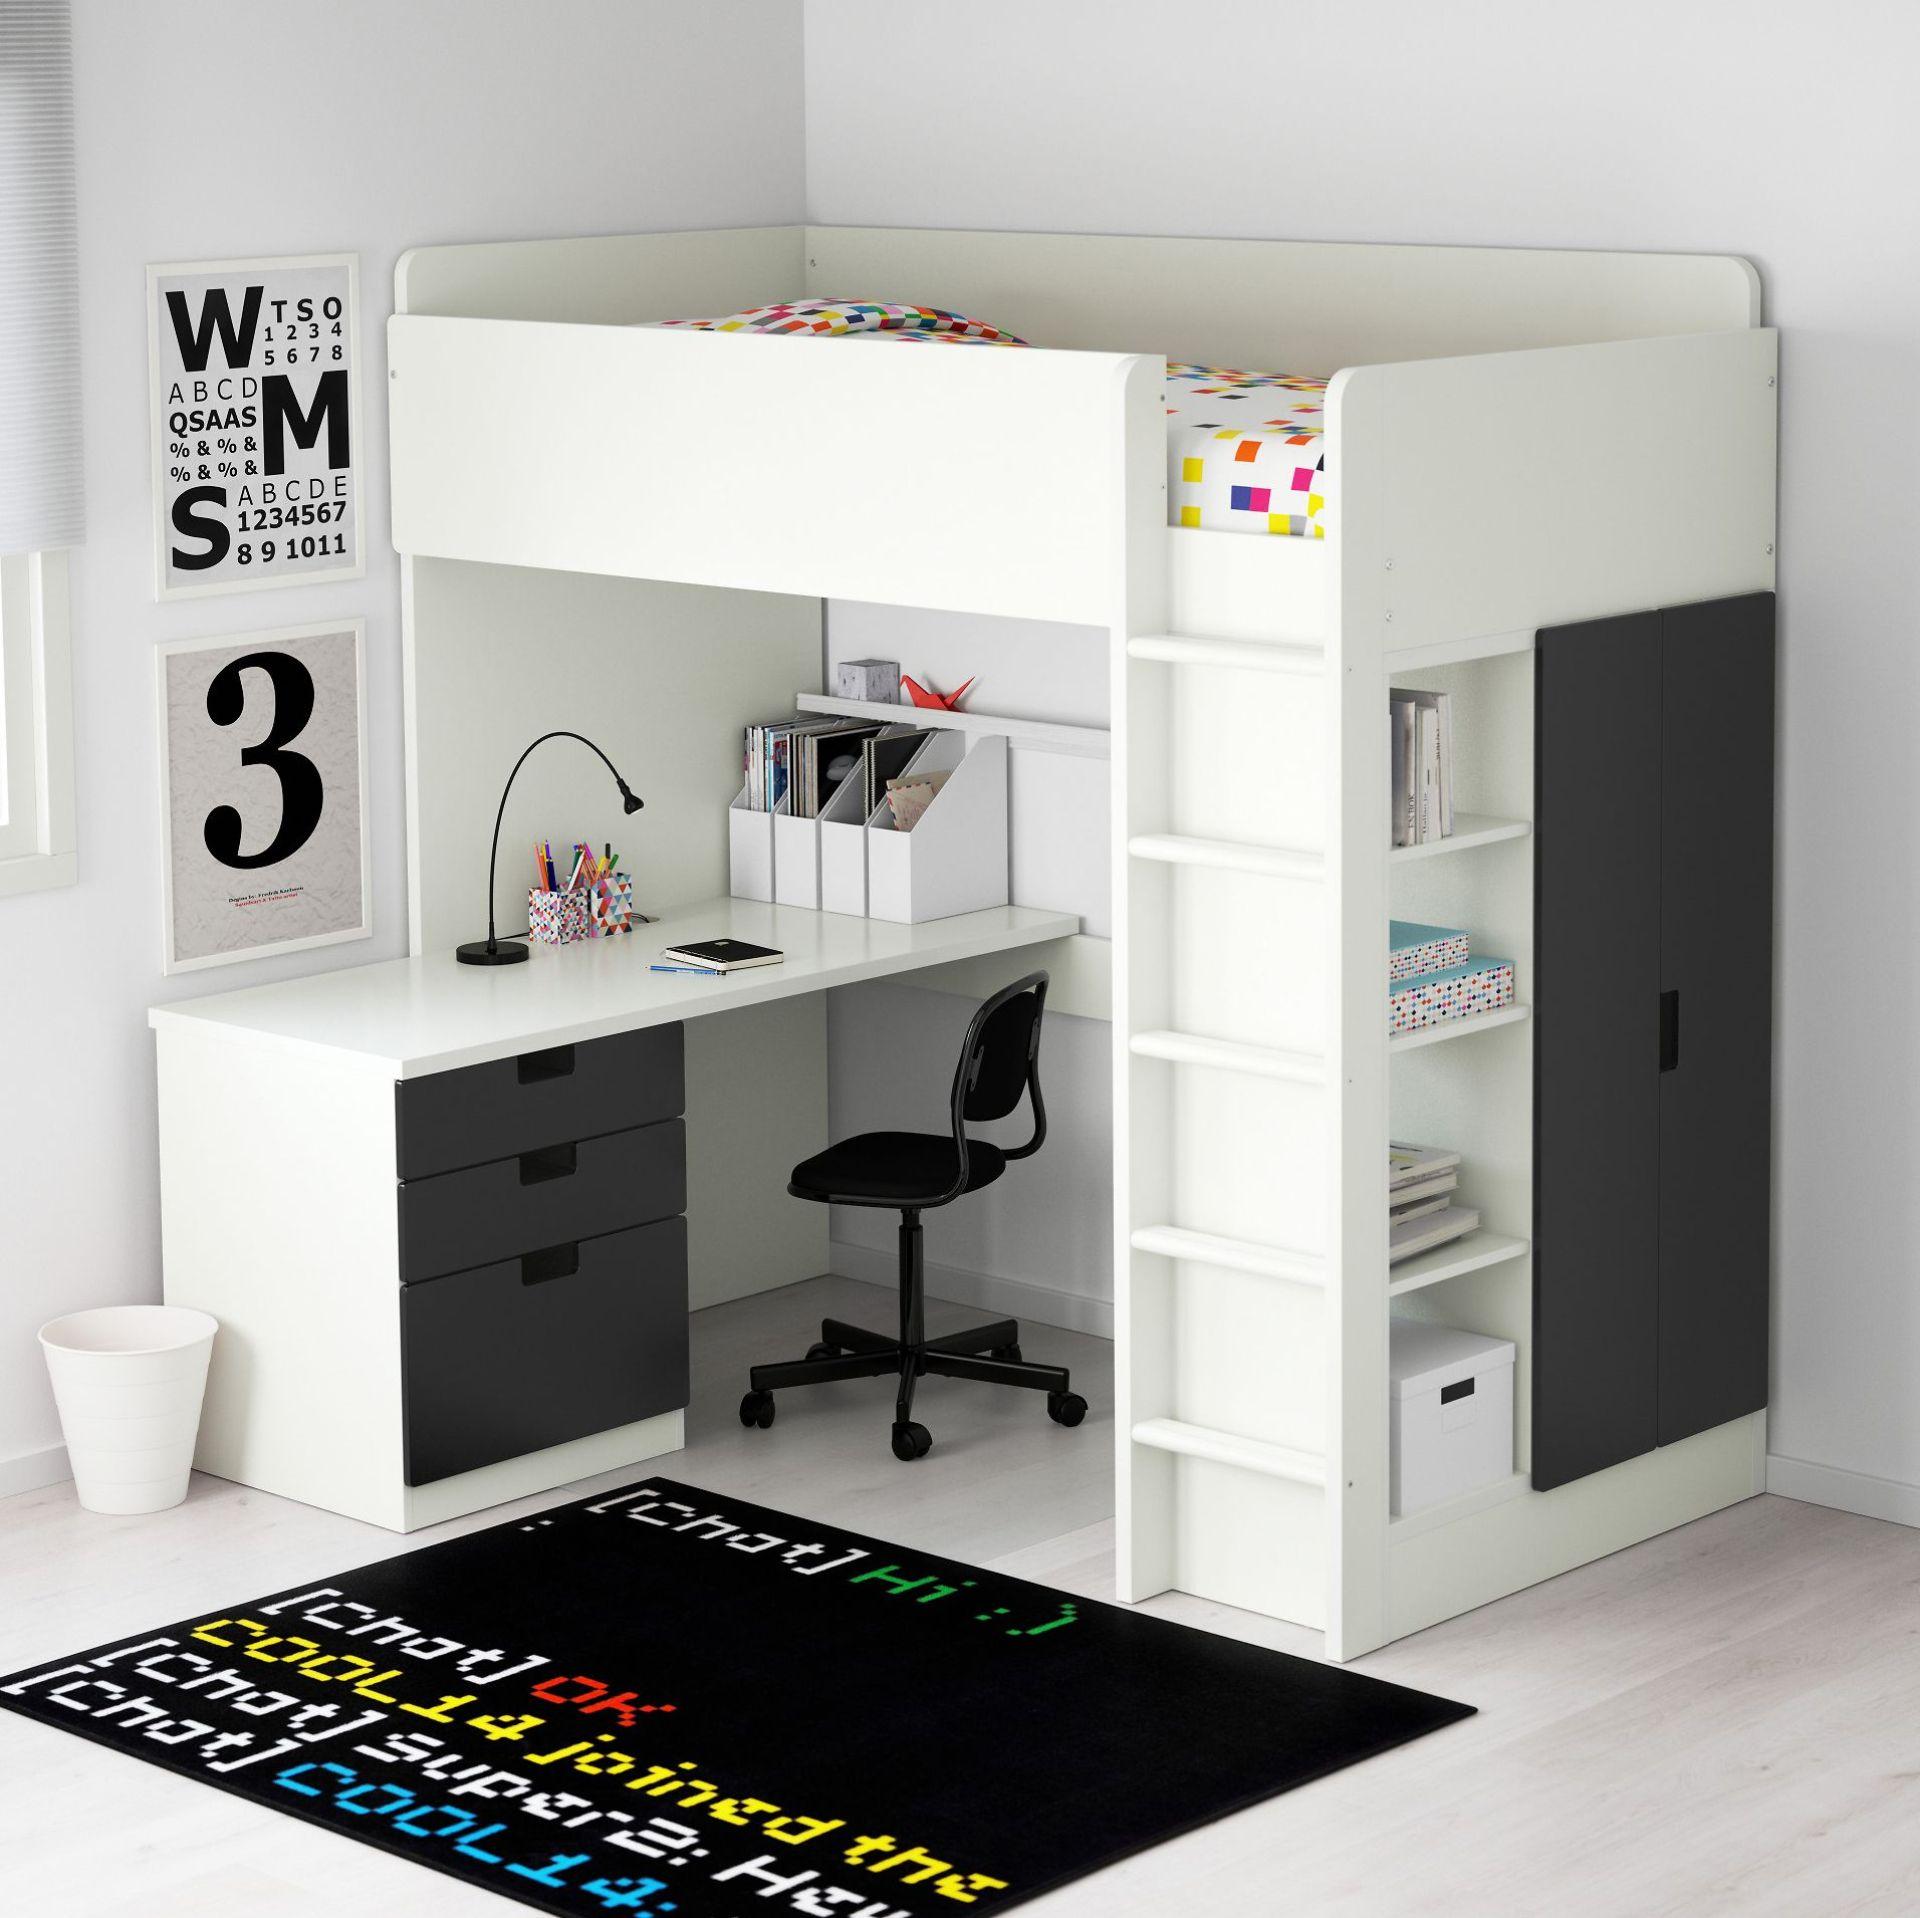 Assembling children's furniture IKEA